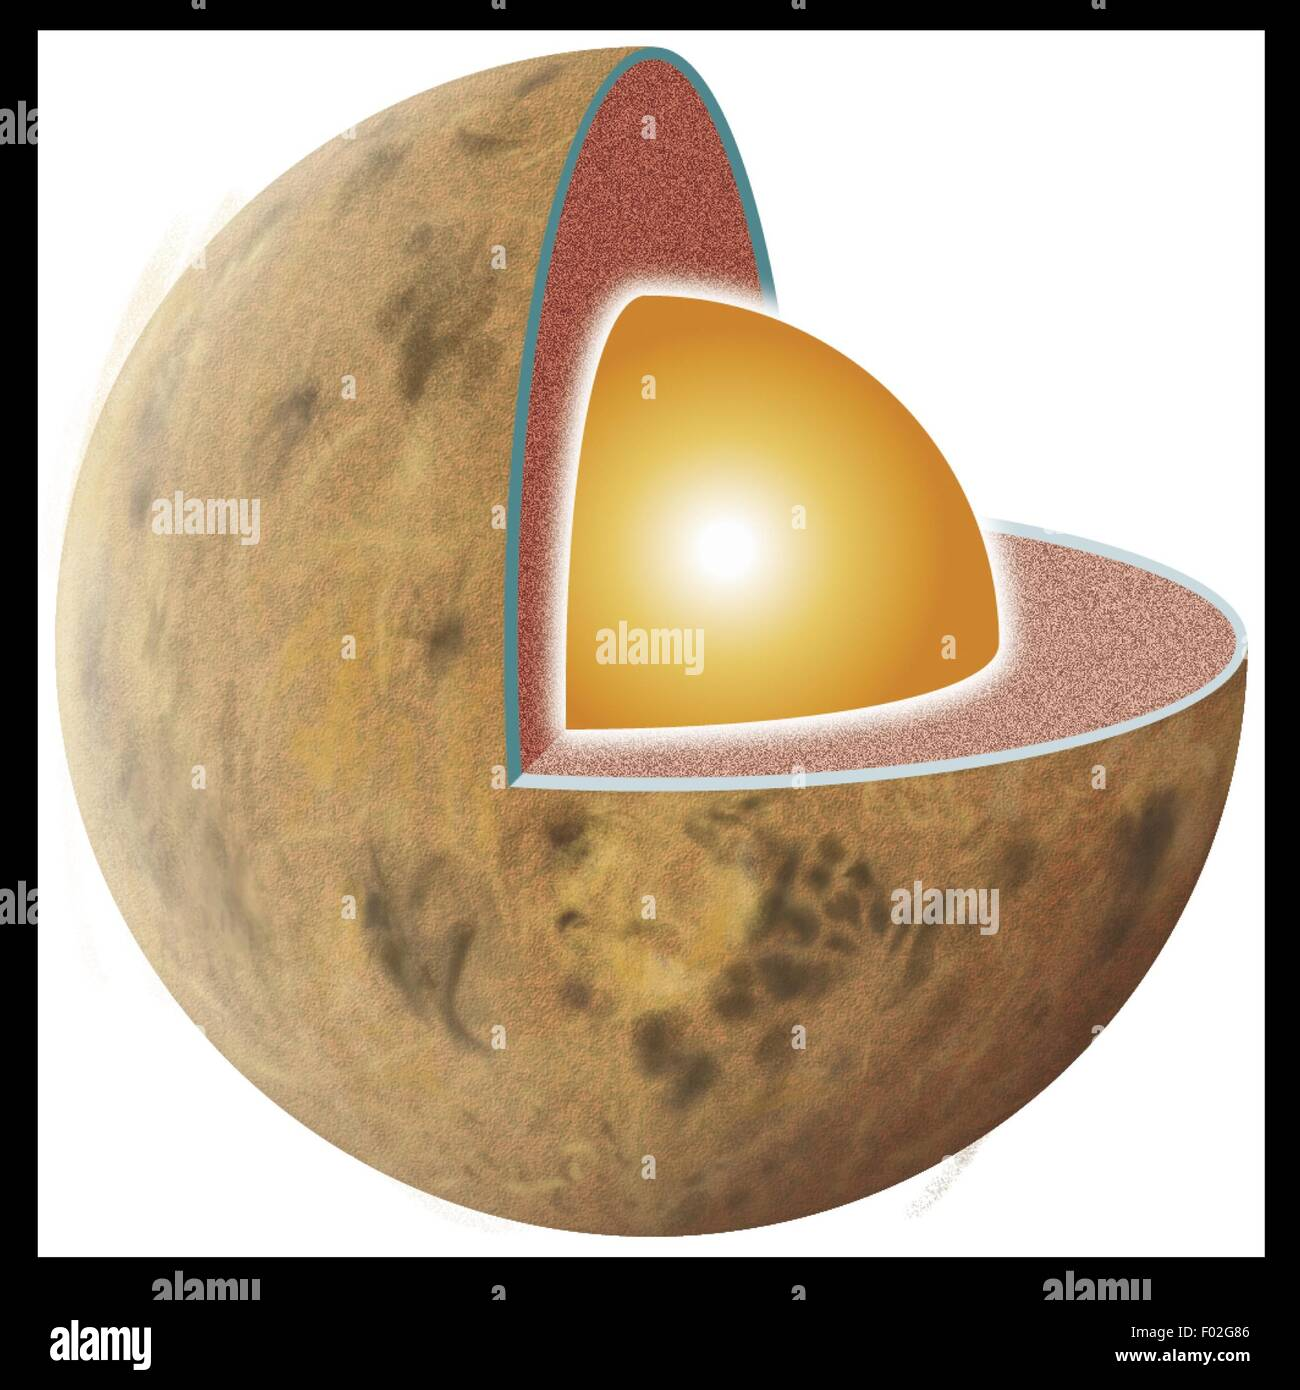 Astronomy - Planets. Mars. Mars interior structure: iron core Stock Photo -  AlamyAlamy